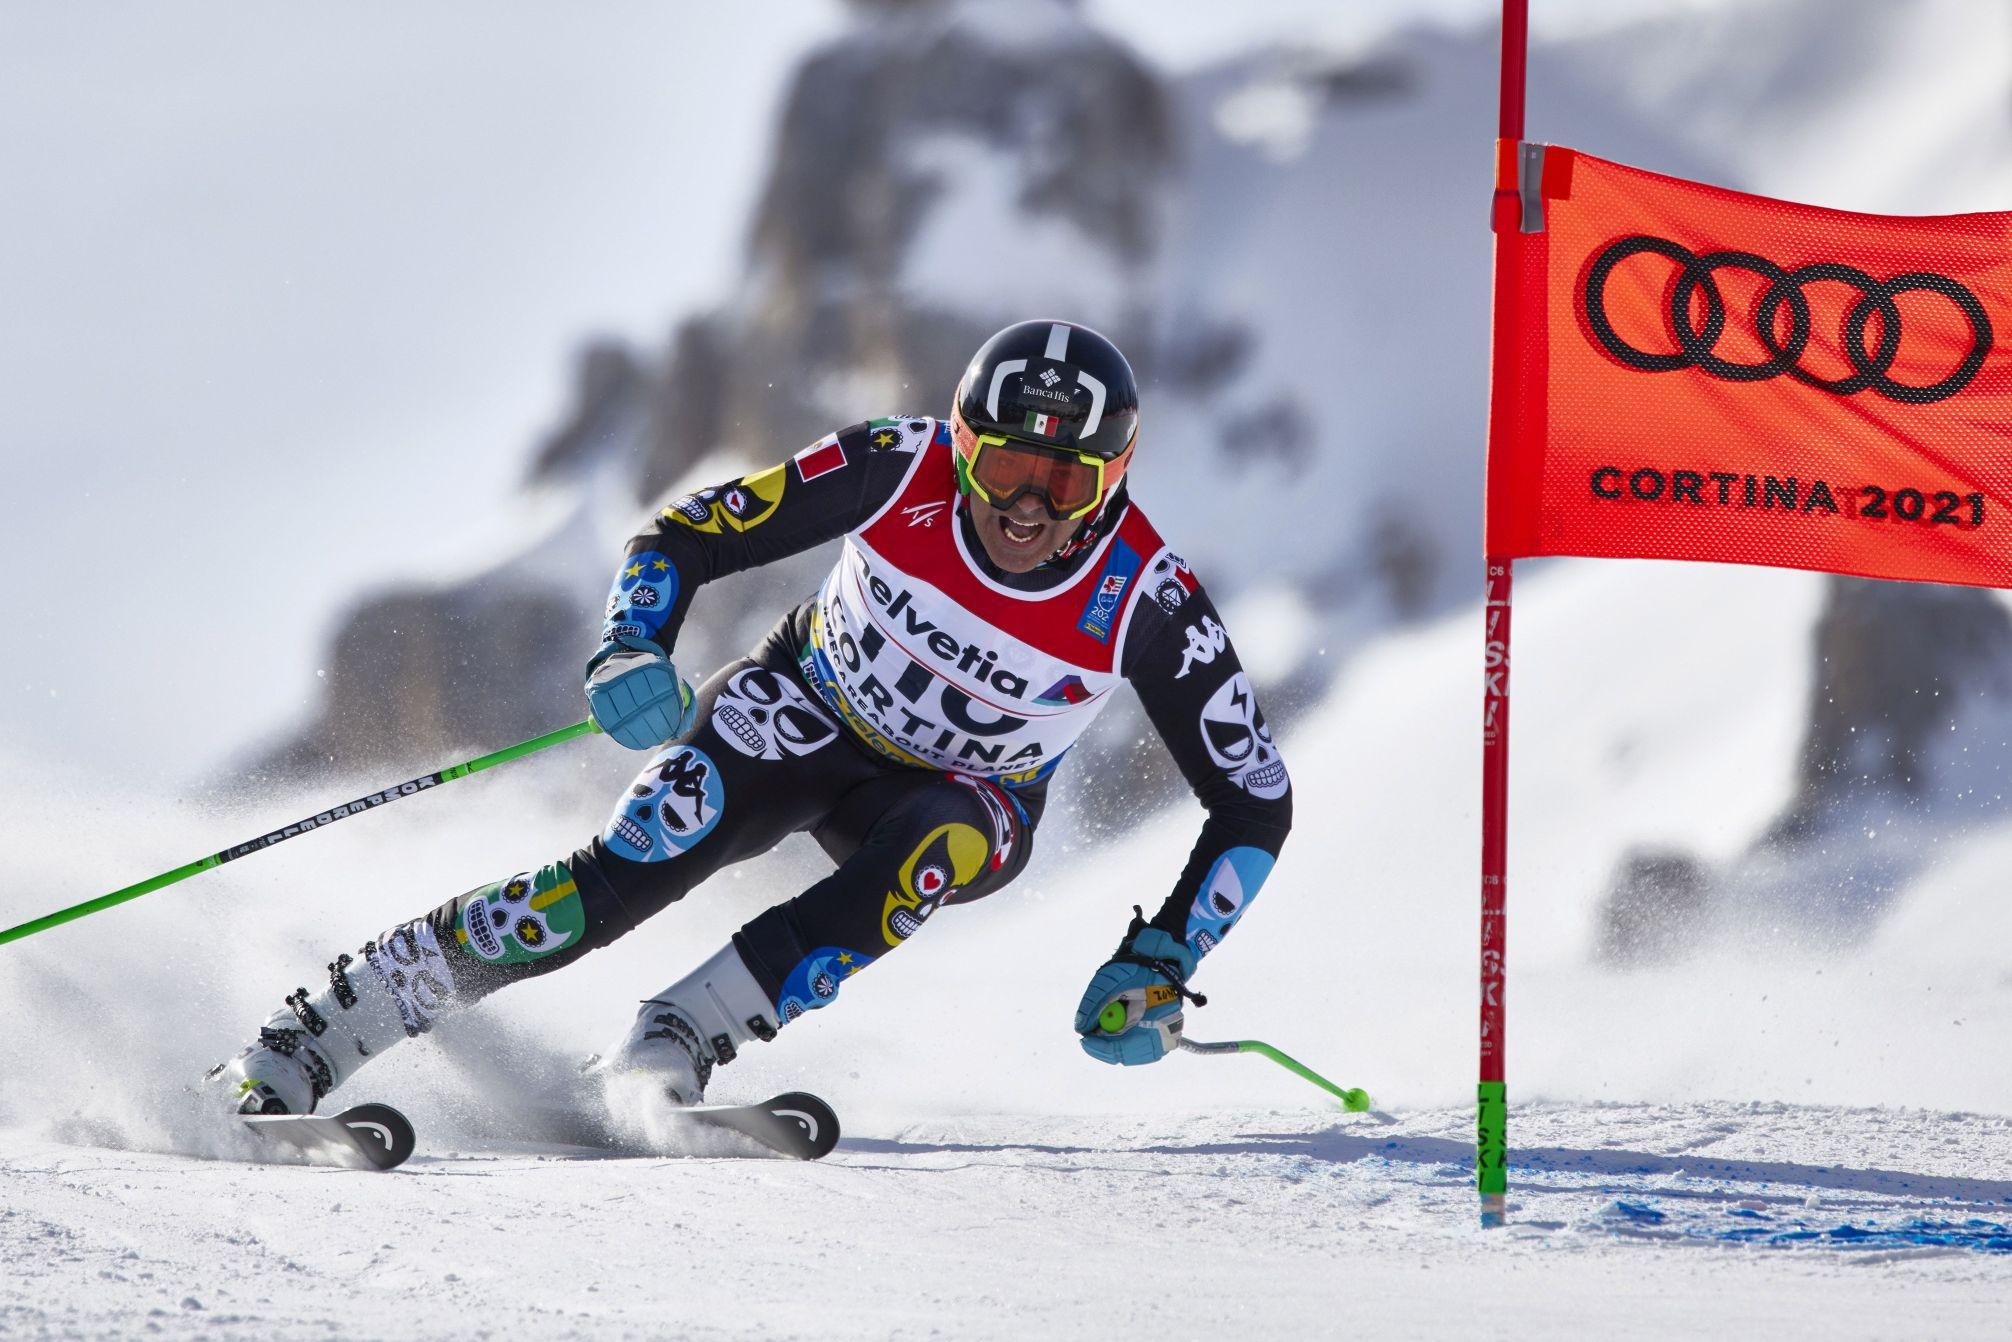 Cortina 2021 Alpine Ski World Championships